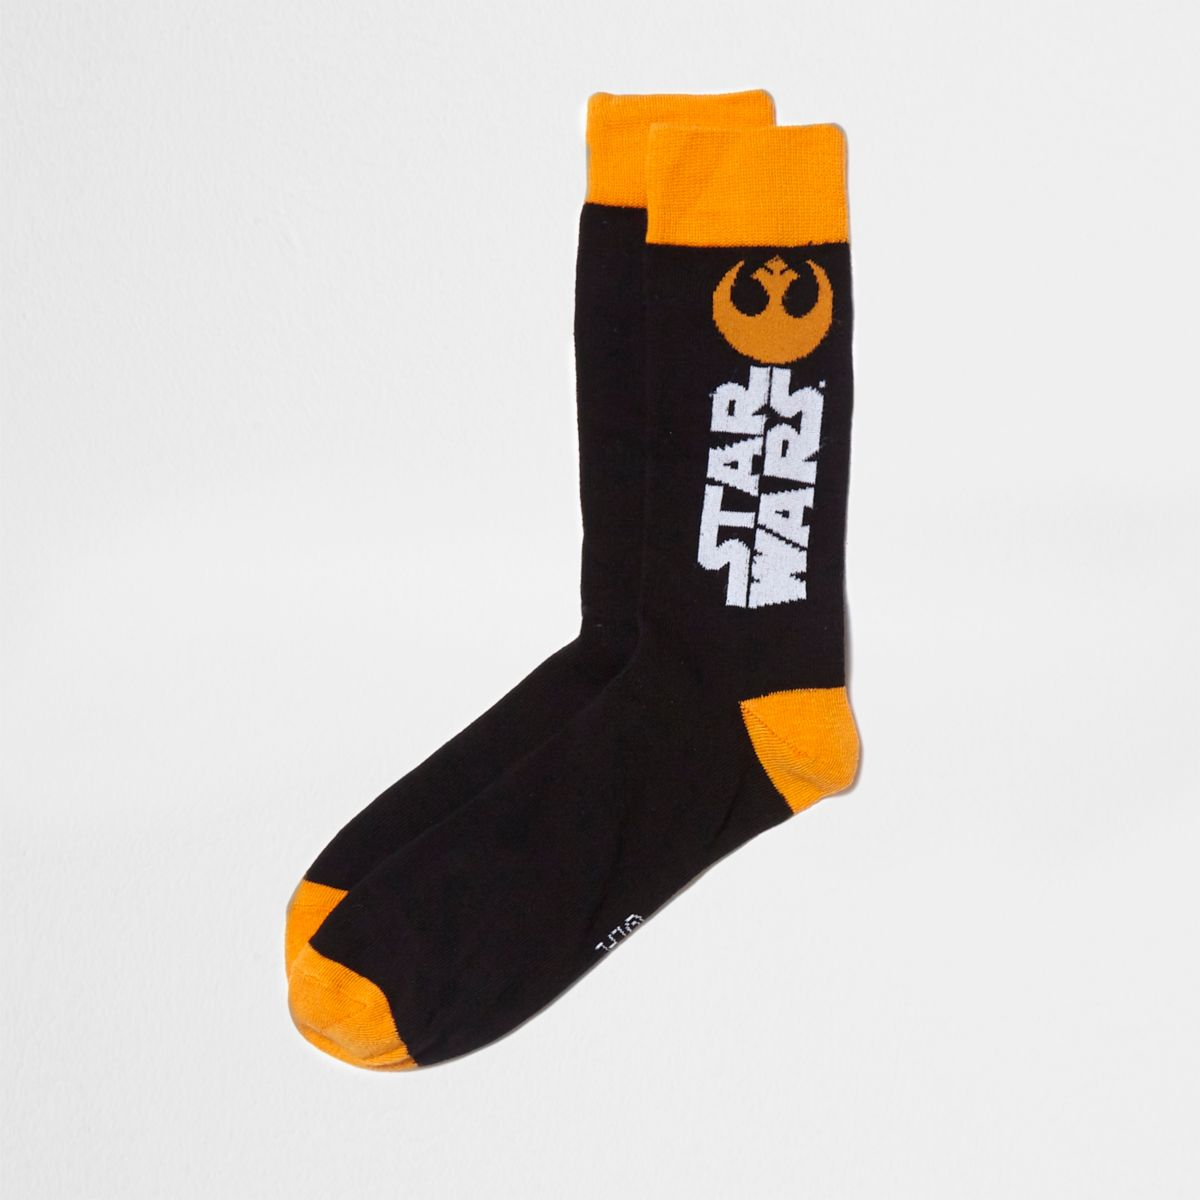 Black 'Star Wars' socks